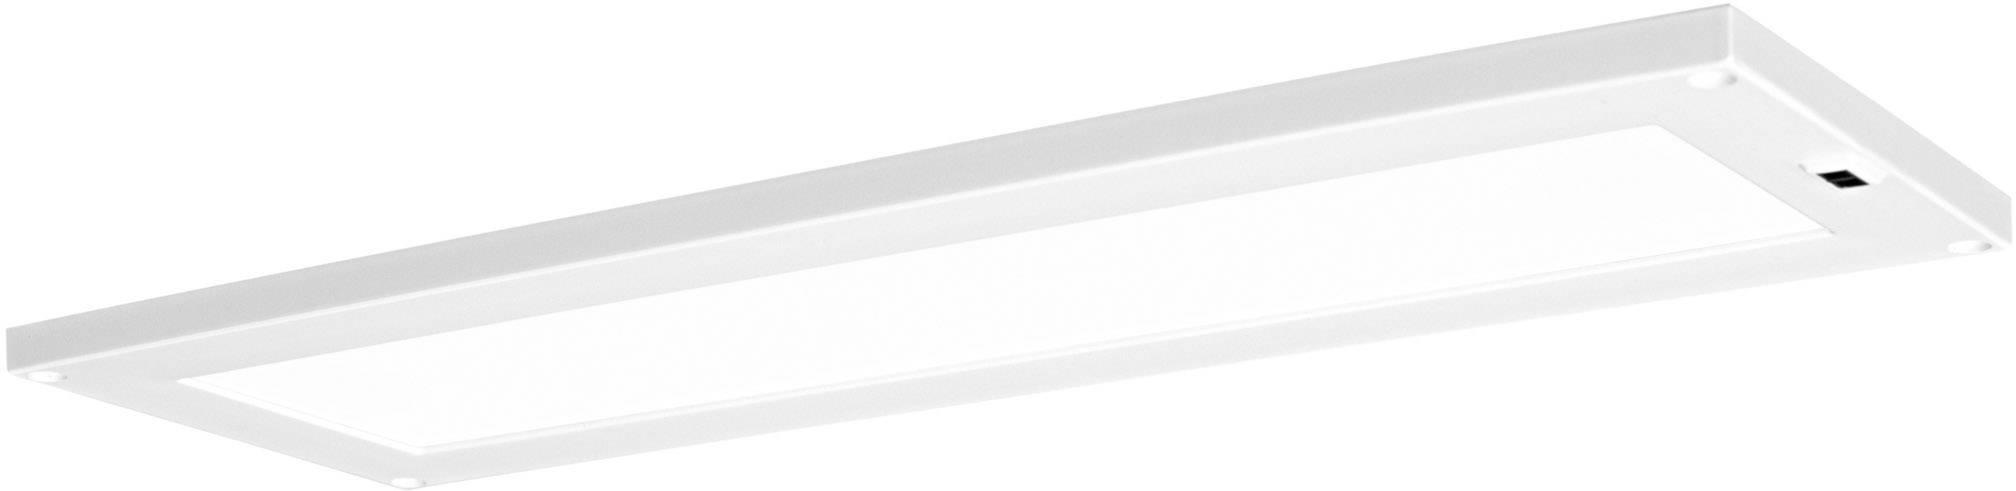 Full Size of Osram Led Panel 32w (1200 X 300mm) Lightify Light List Table Lamp Planon Plus 60x30cm Ledvance 40w 600x600   4000k Pure Surface Mount Kit Frameless 1200x300mm Wohnzimmer Osram Led Panel